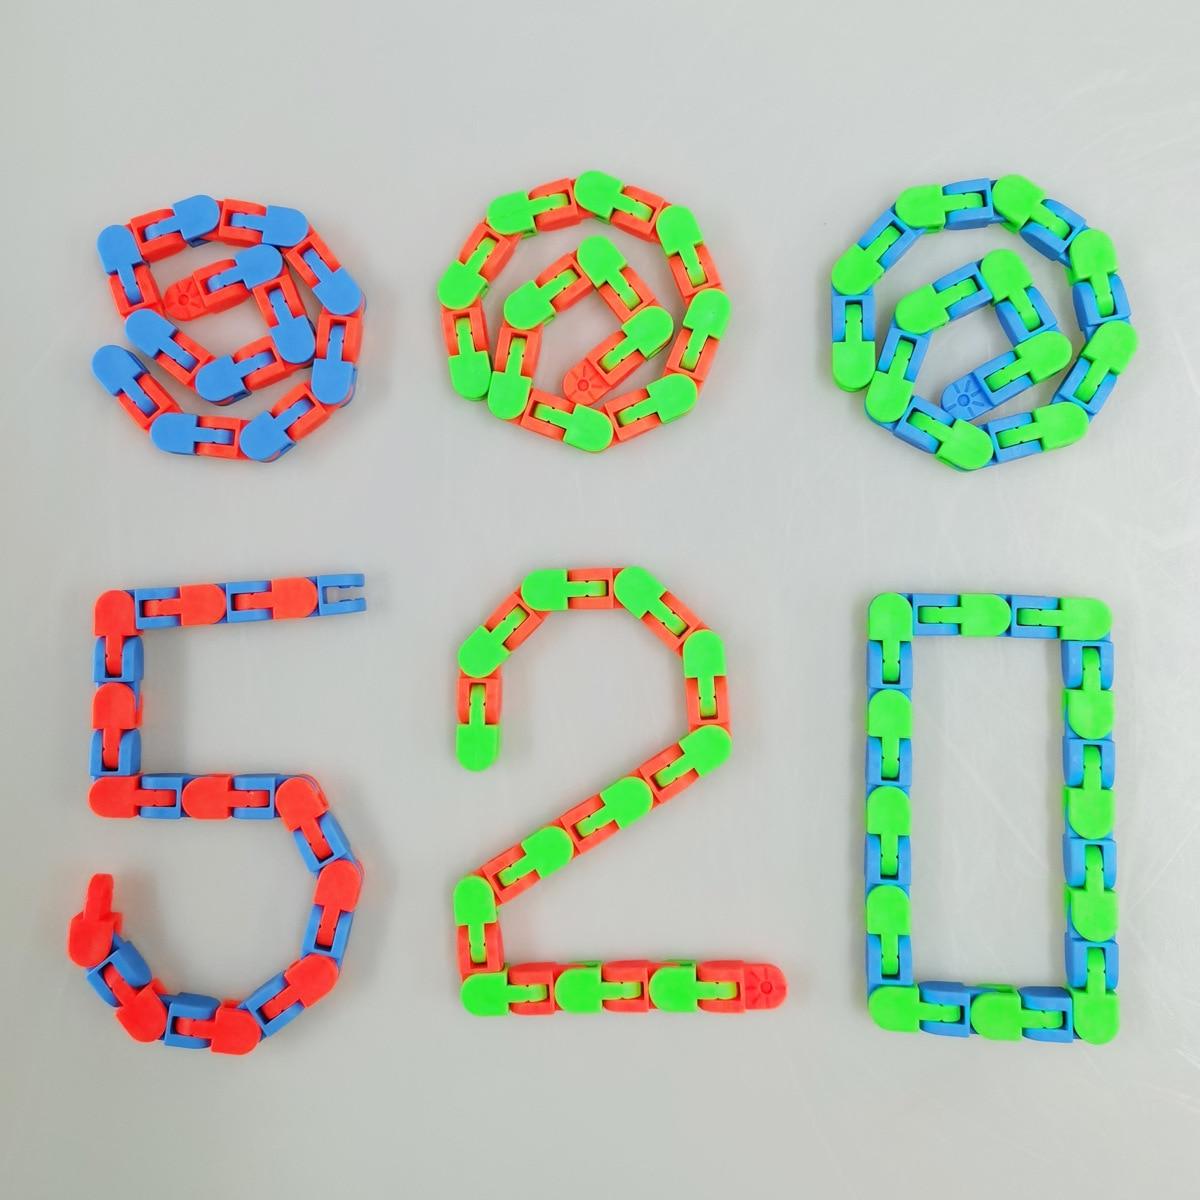 1PCS 48 Knots Fidget Toys Children And Adults Puzzle Decompression 48-Segment Chain DIY Bicycle Chain Toy Fluid Bracelet Sensory img3